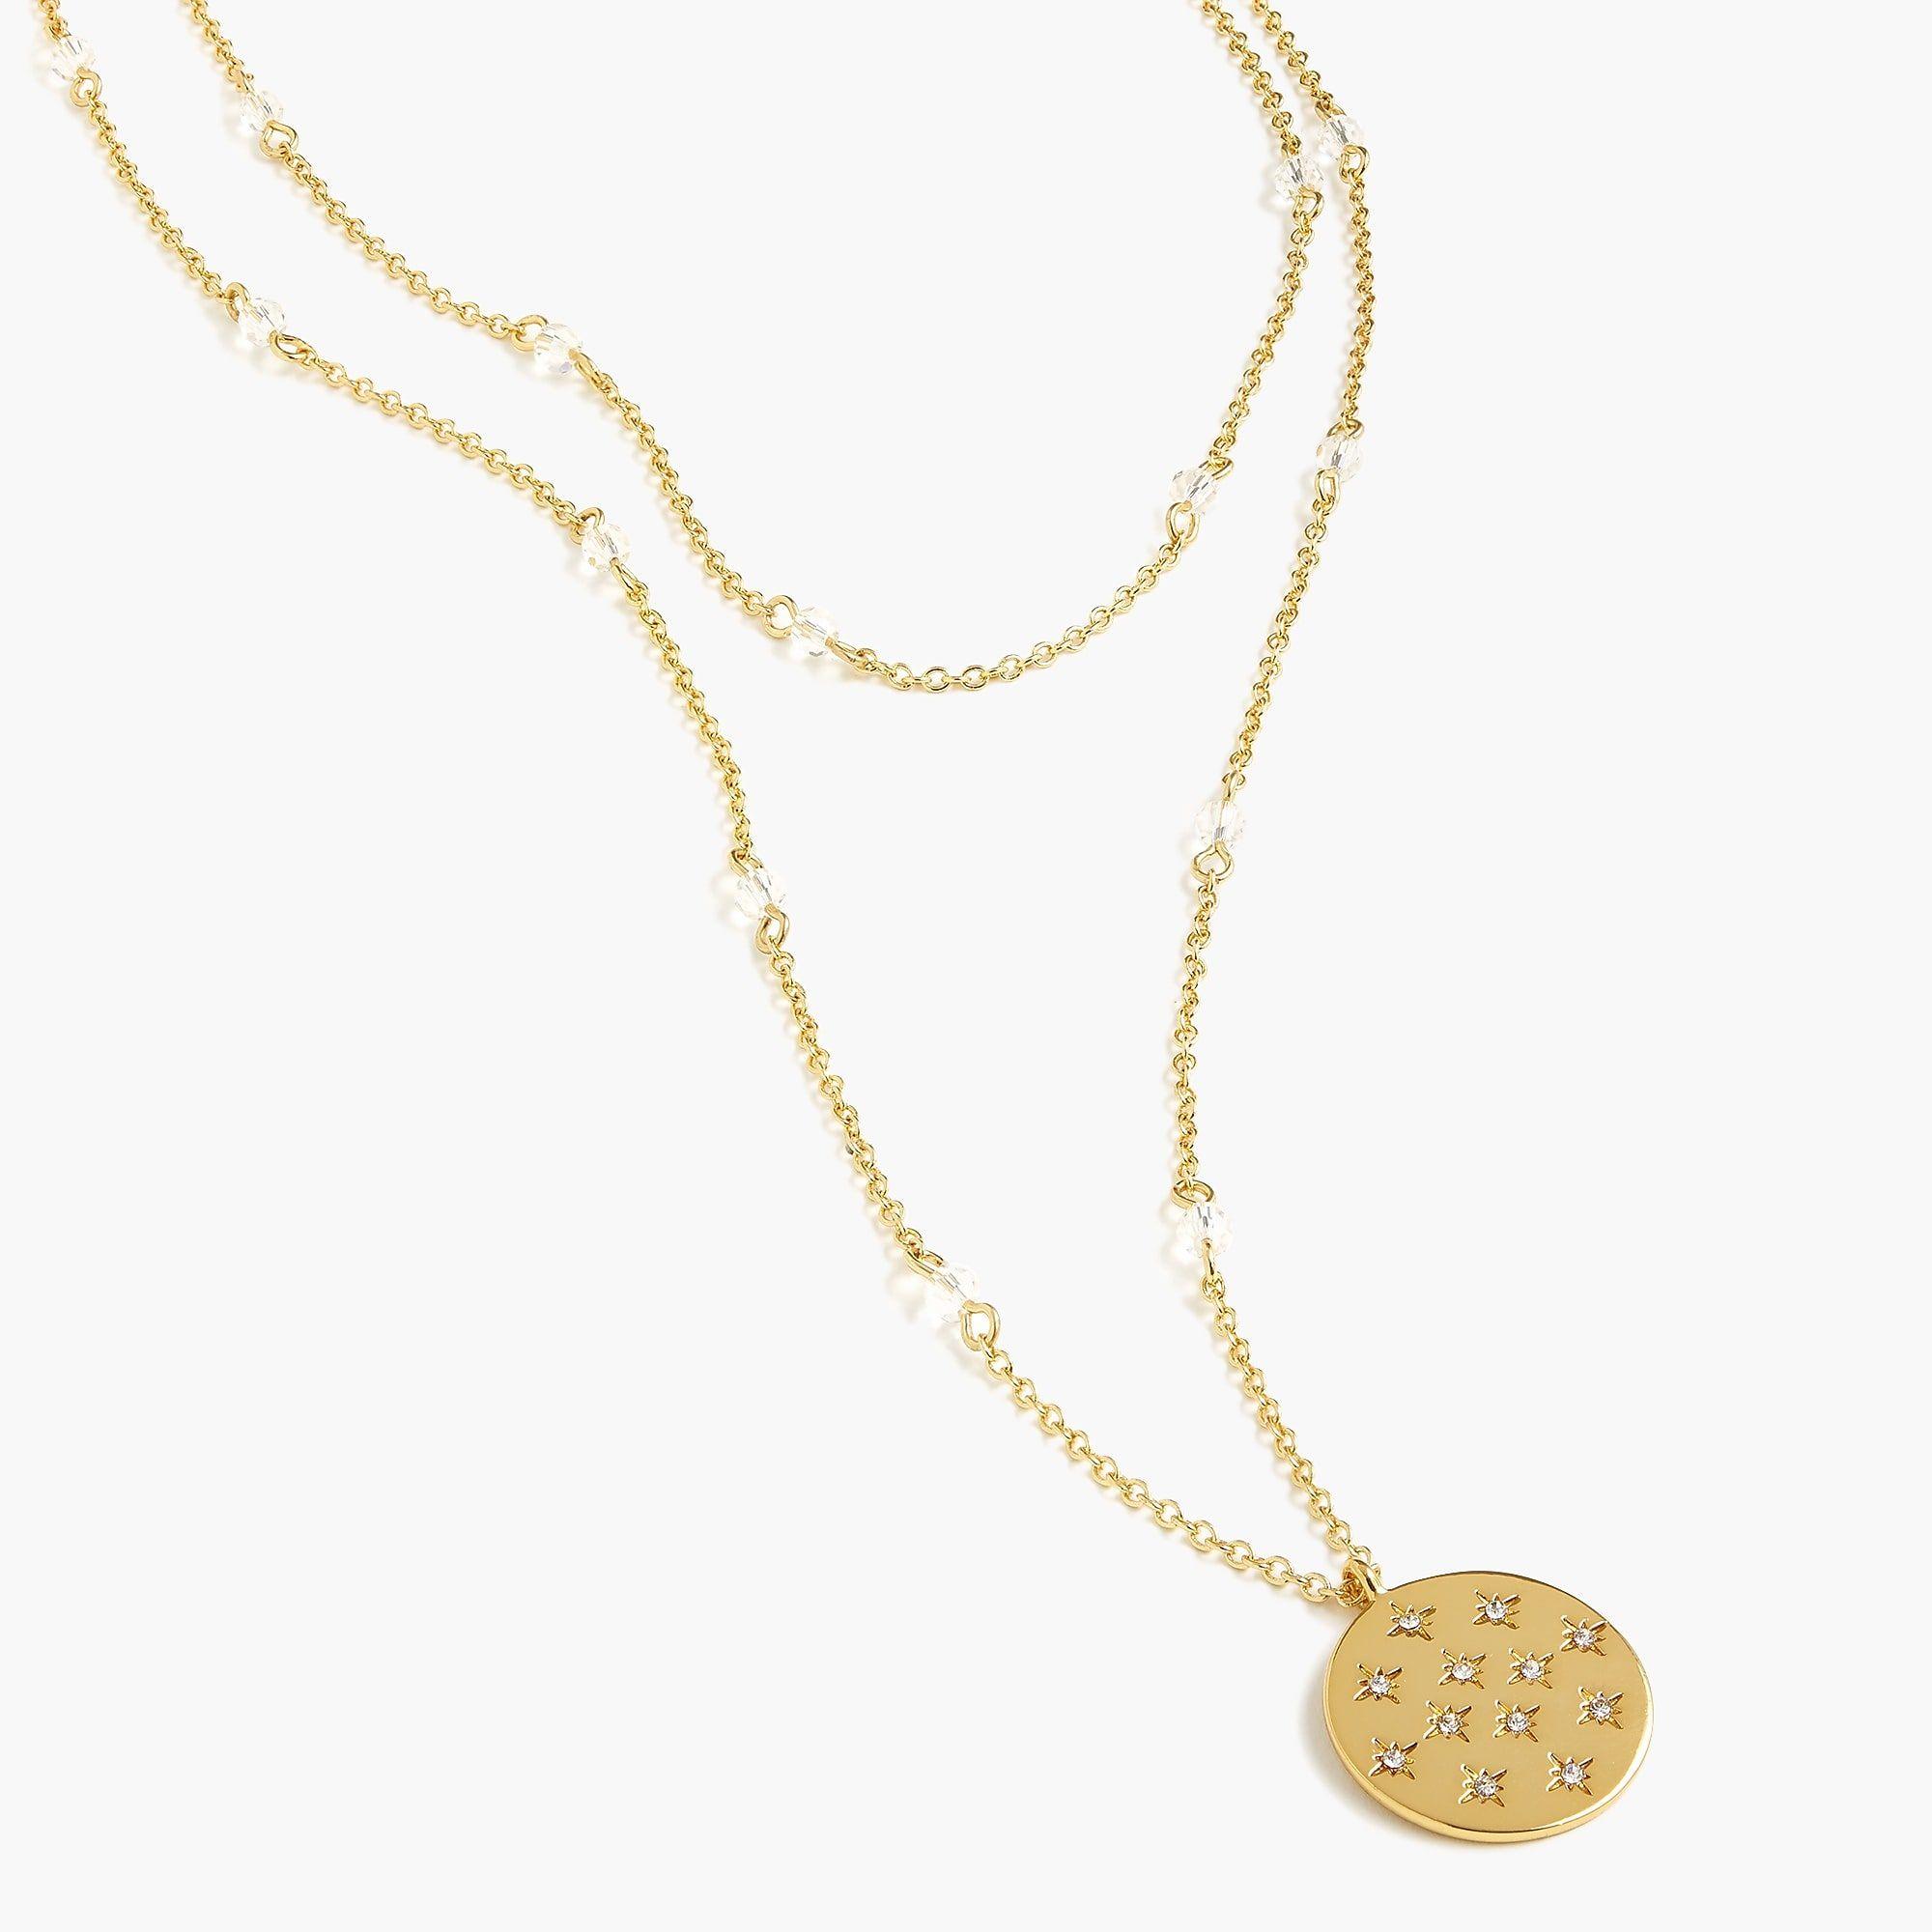 Shop the womenus alison lou x jcrew layered pendant necklace at j